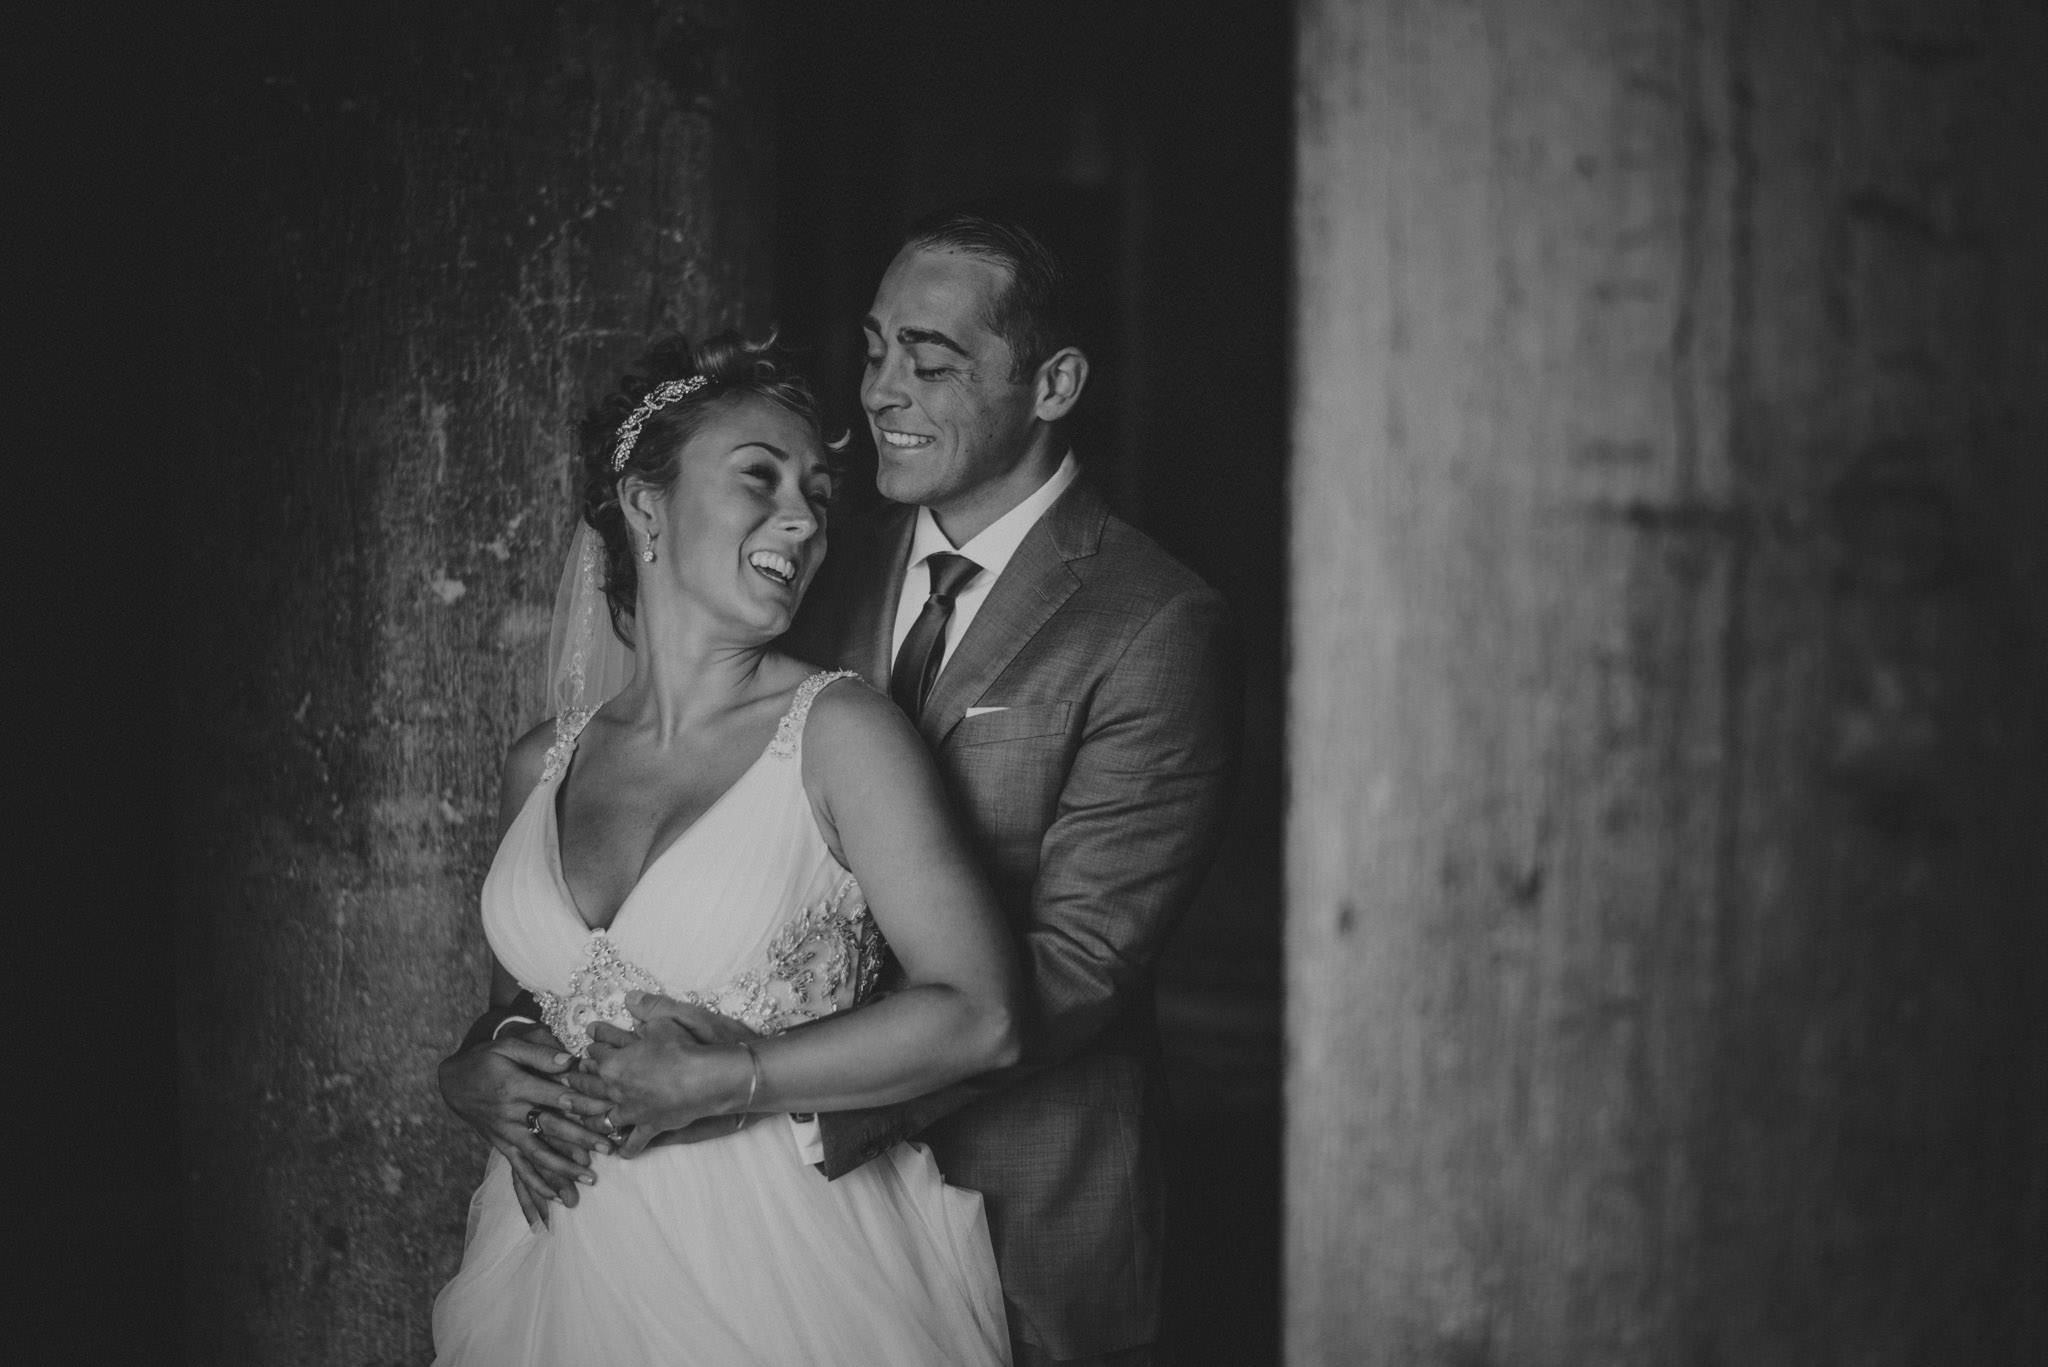 wedding-in-venice-roberto-panciatici-photography-33